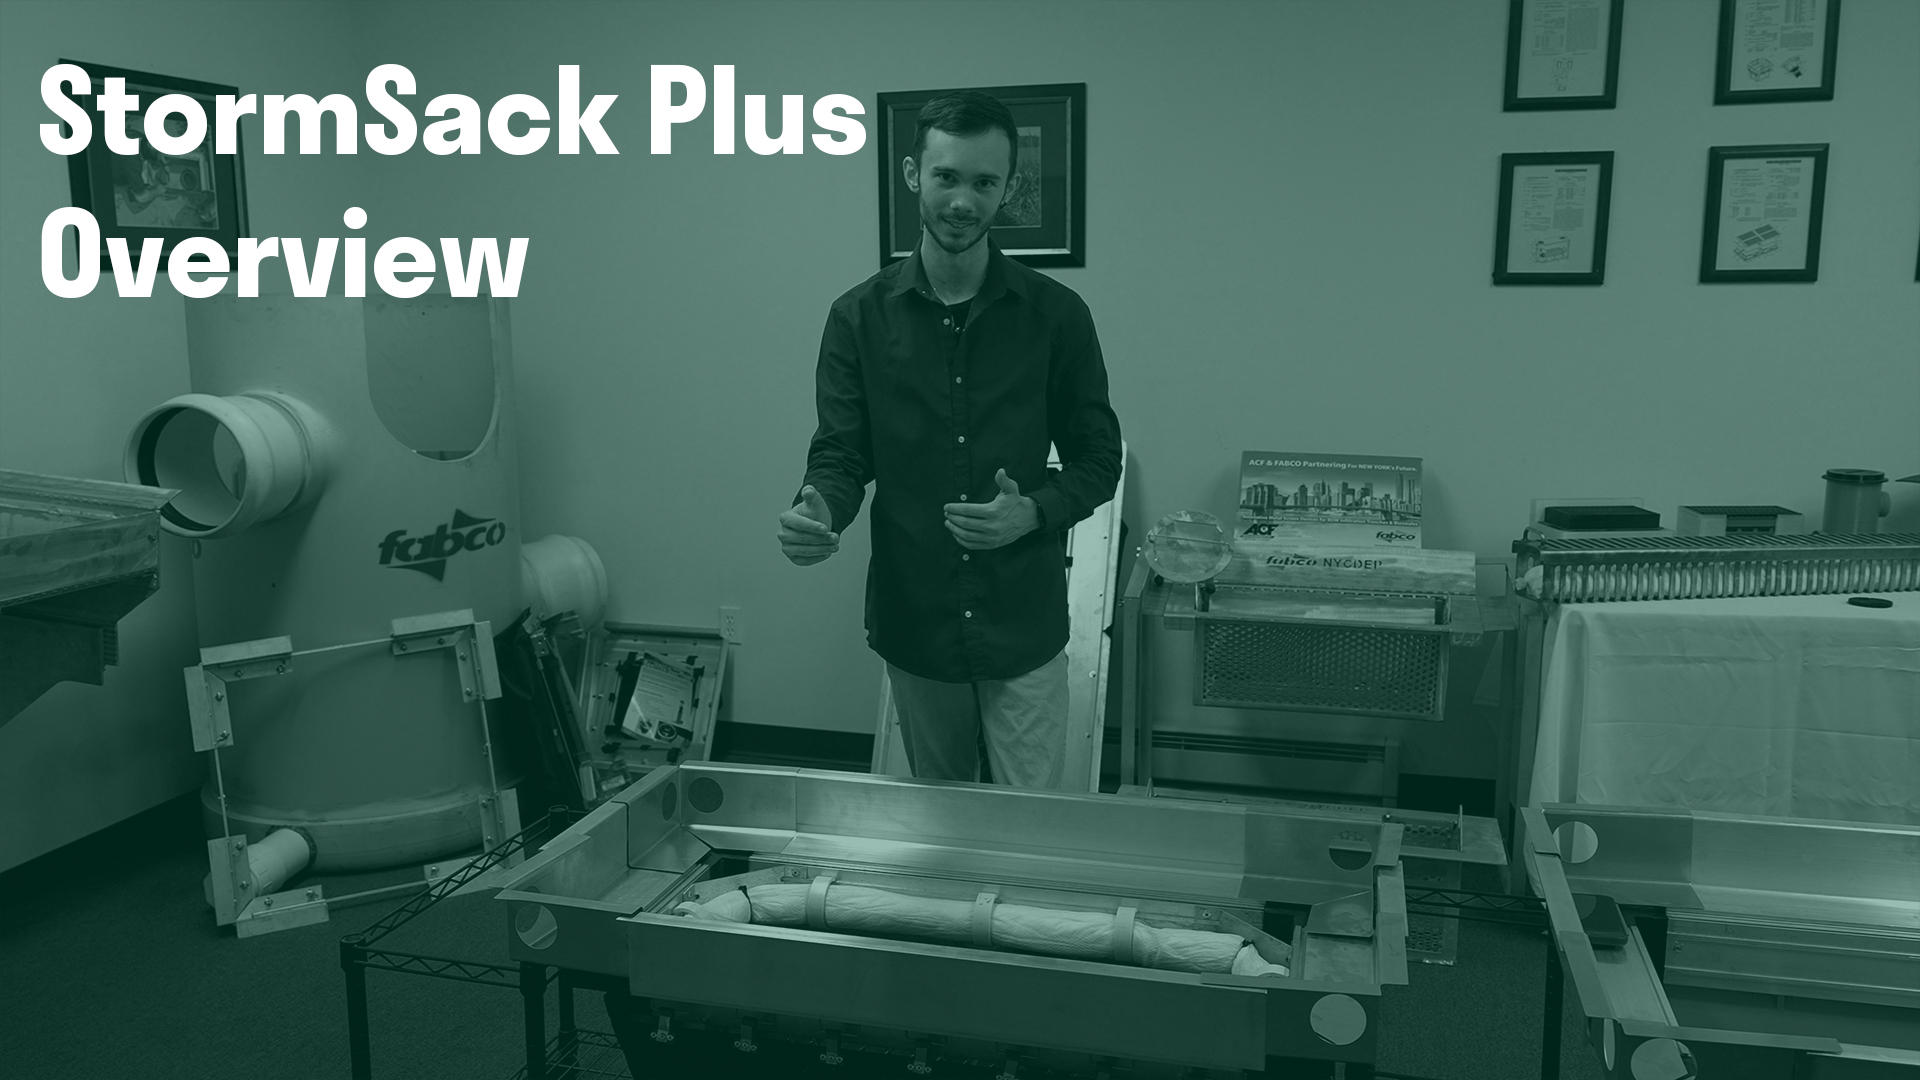 StormSack Plus Overview